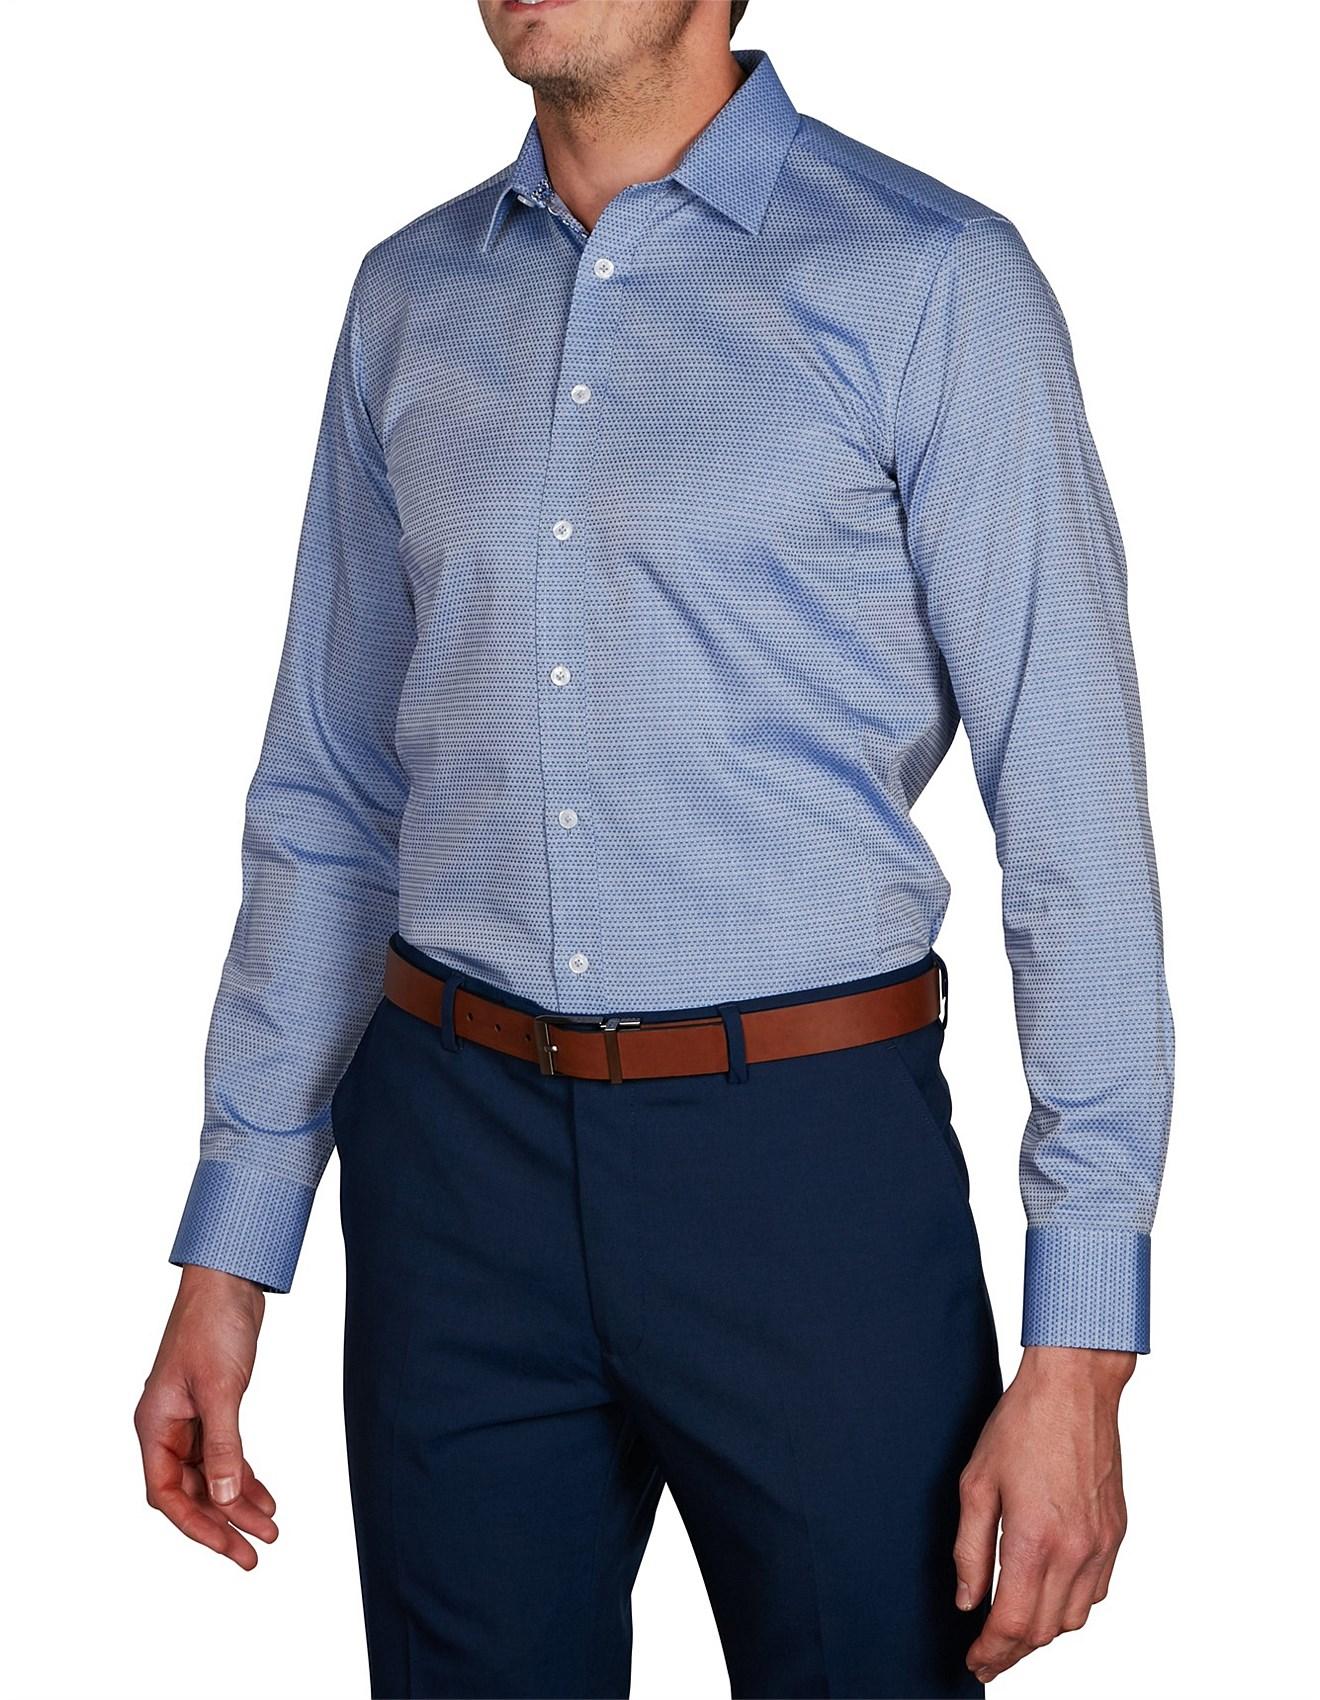 Men 39 s fashion clothing fashion accessories david for Super slim dress shirts